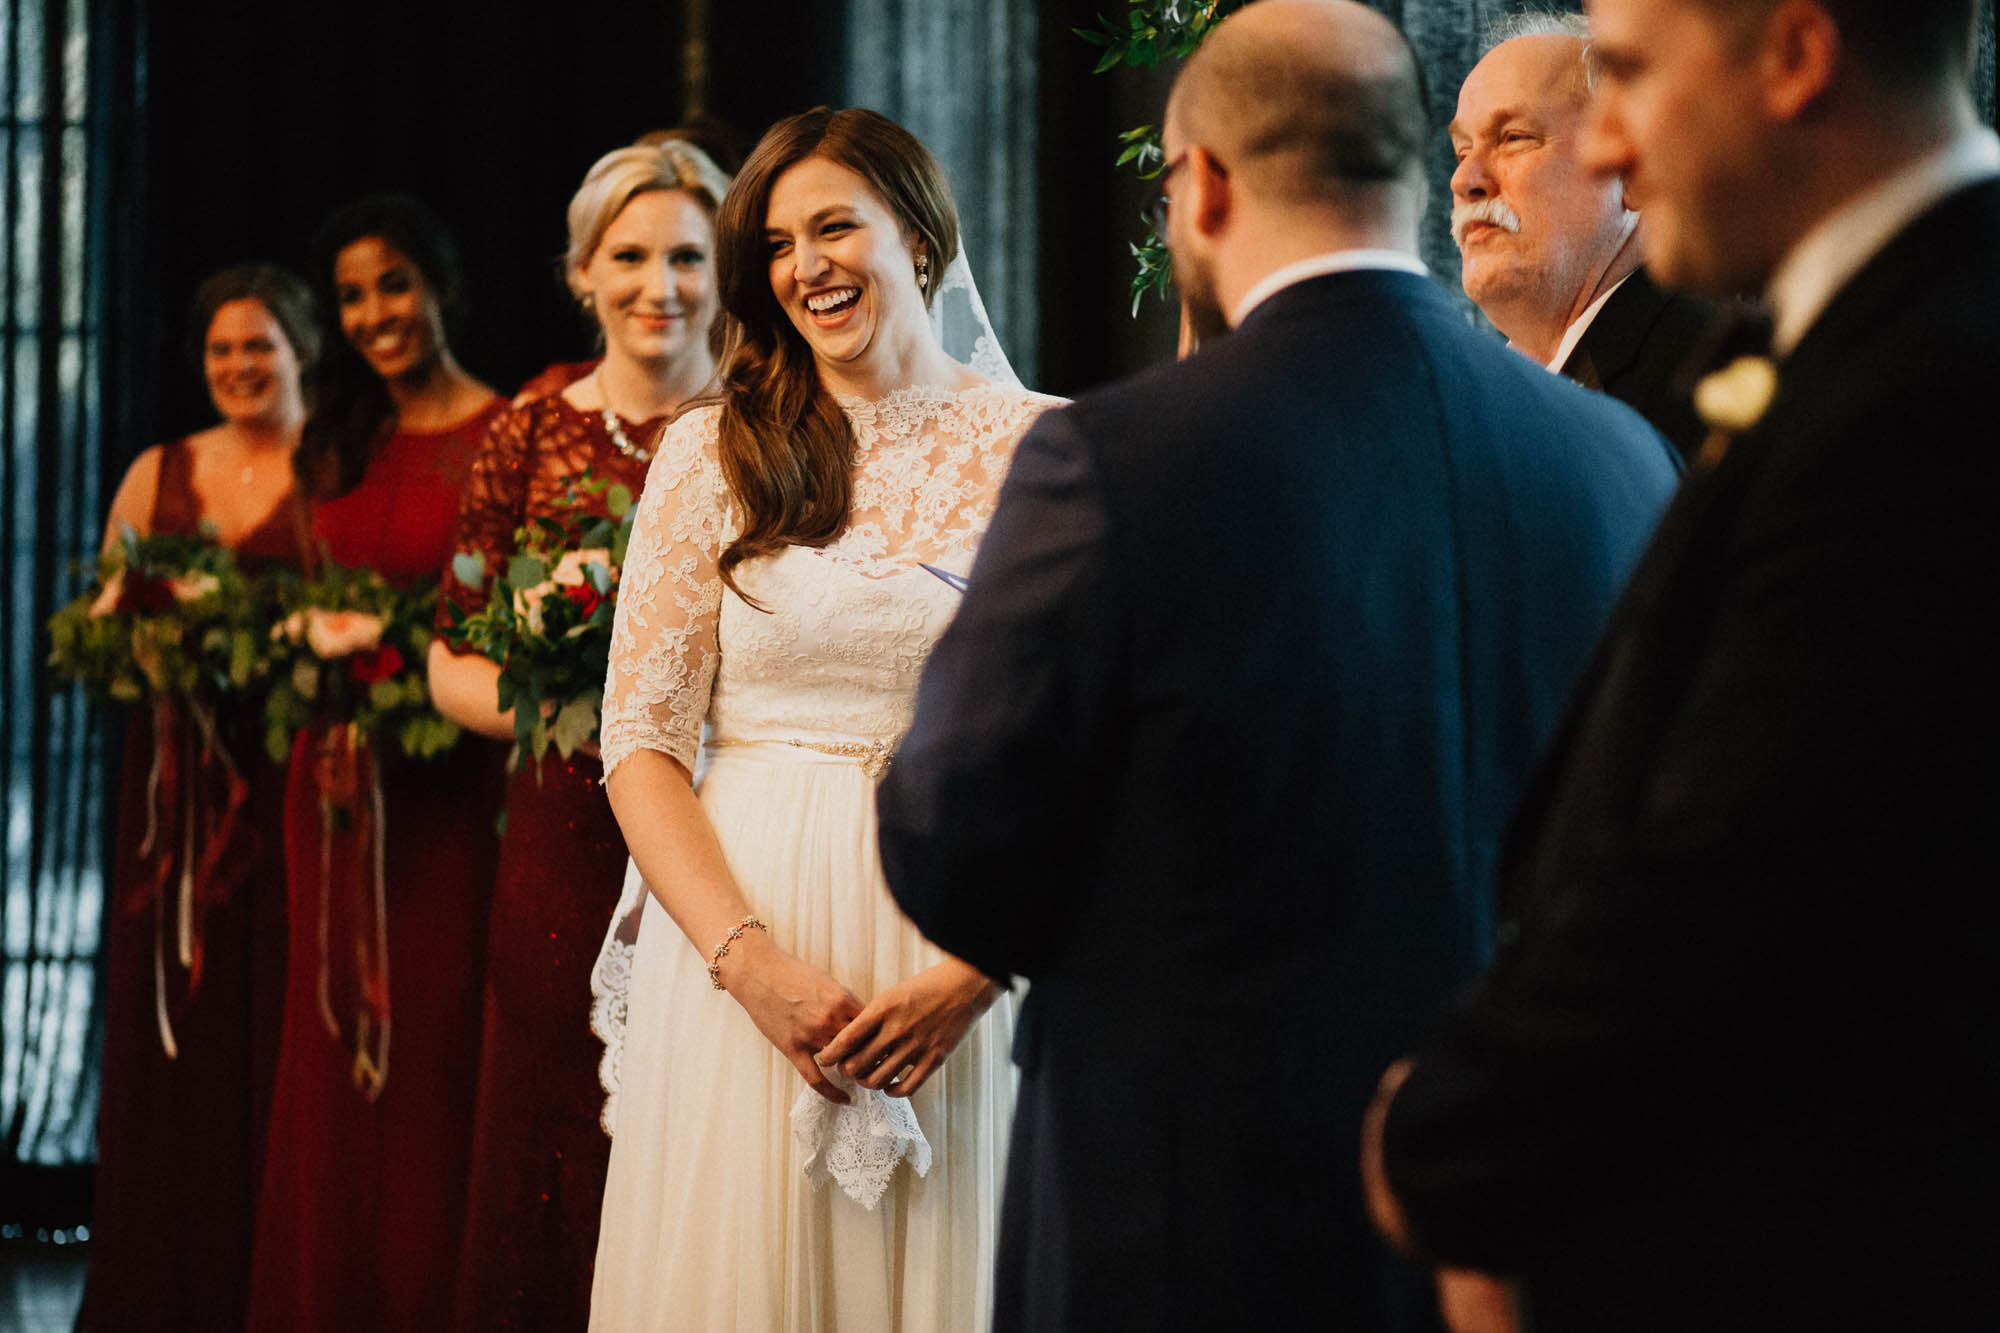 Highline-Car-House-Wedding-Columbus-Kristin-Aaron-075.jpg